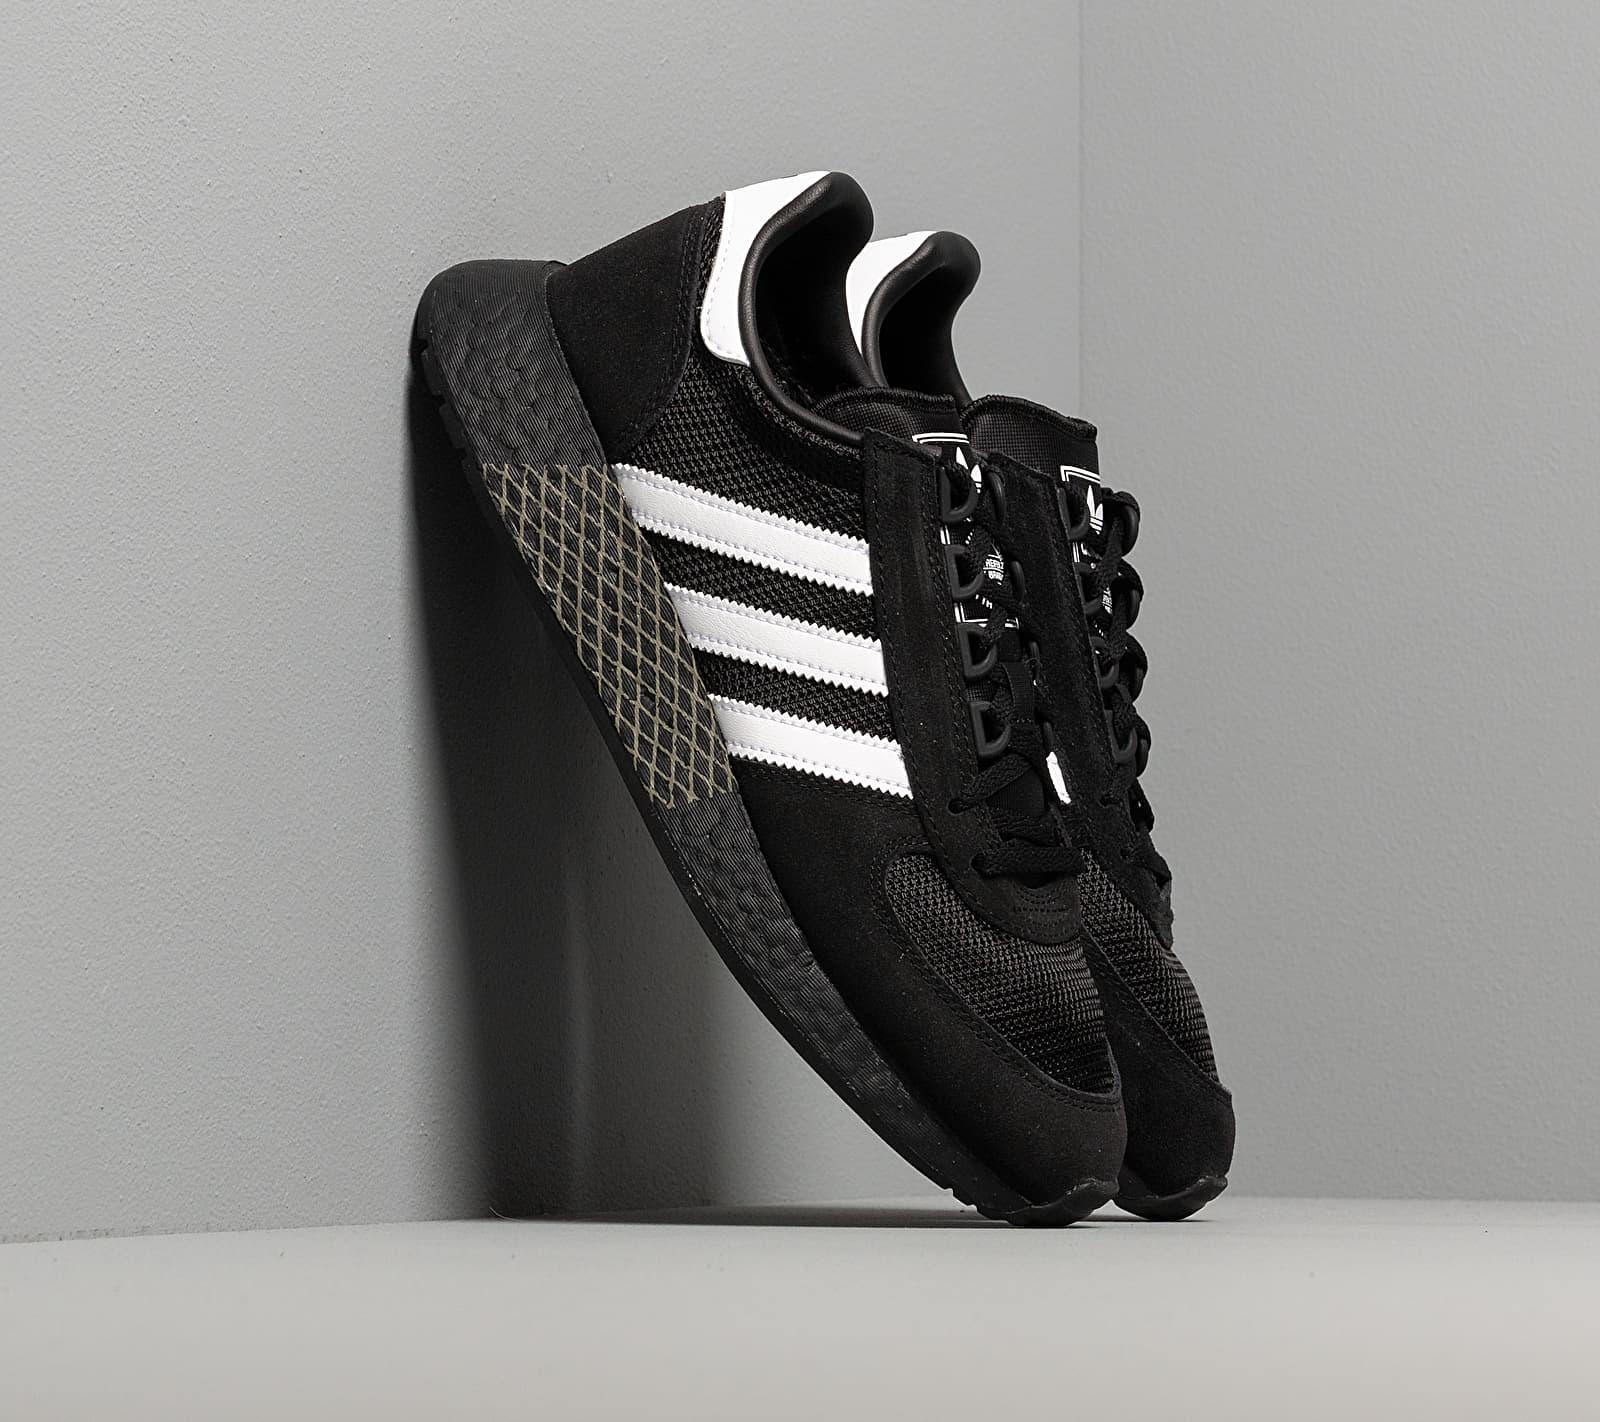 Adidas Yeezy Calabasas Track Pants (dunkelblau)